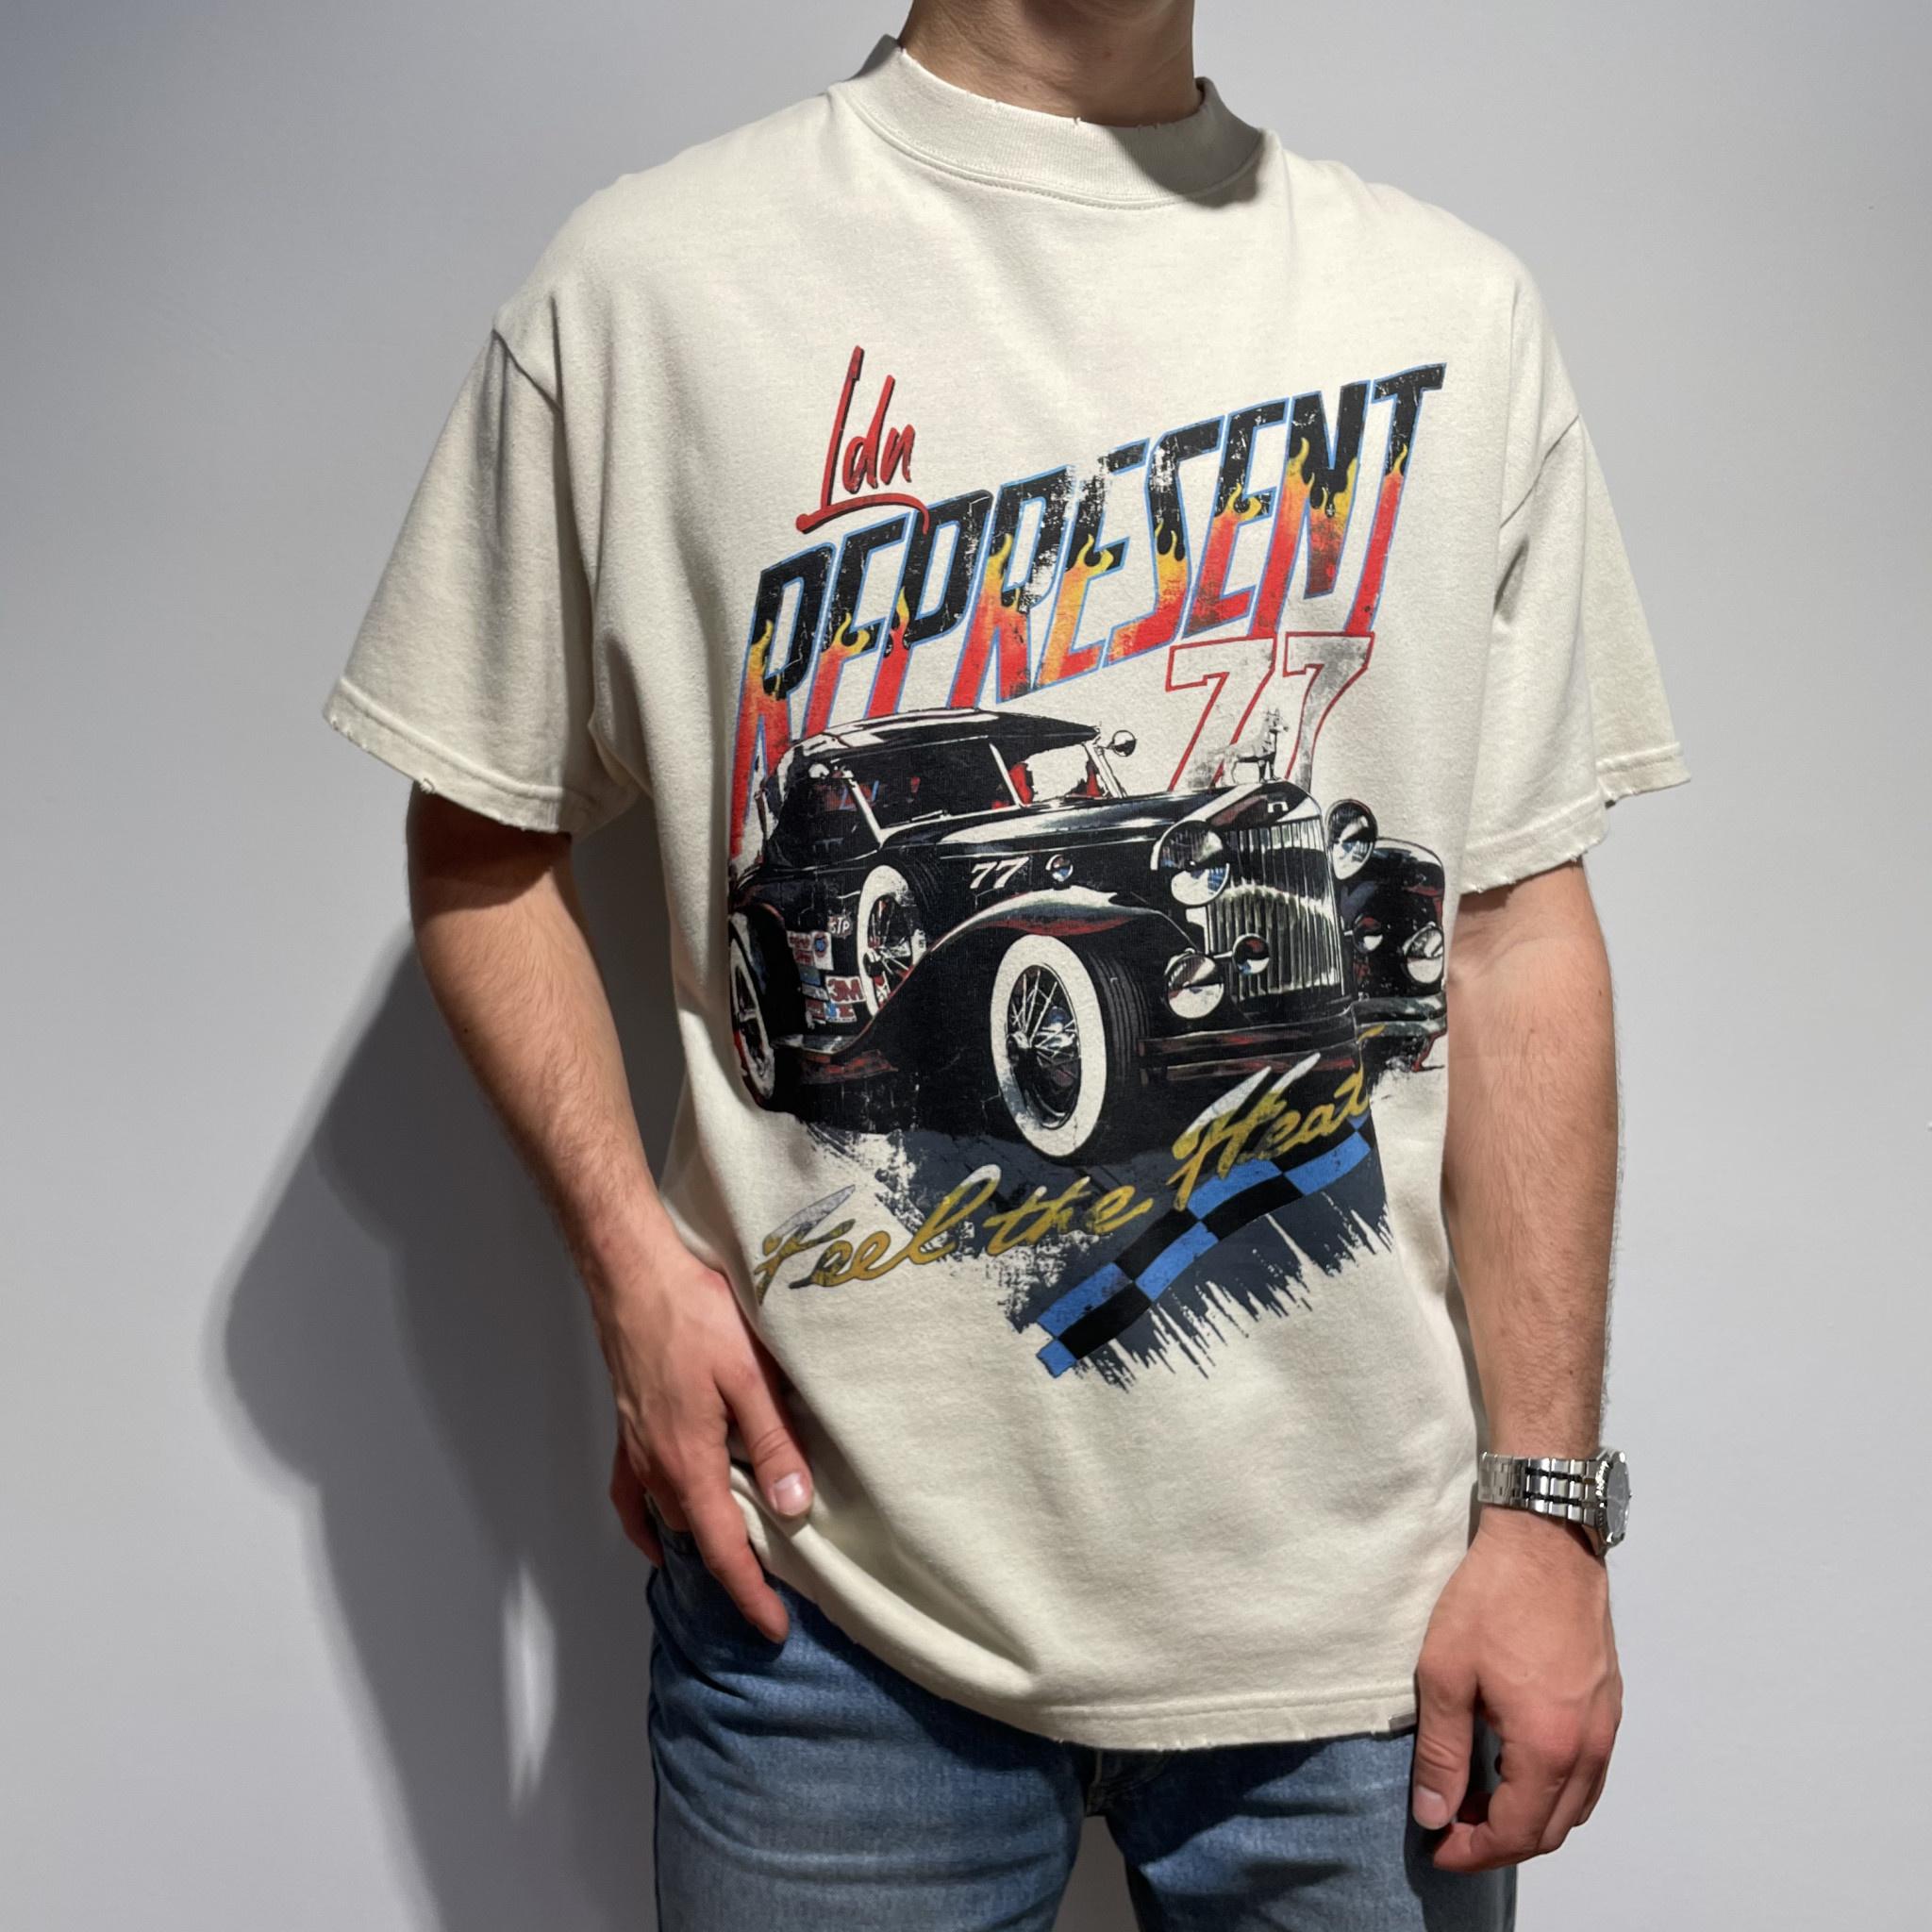 Feel The Heat T-Shirt - Vintage White-1